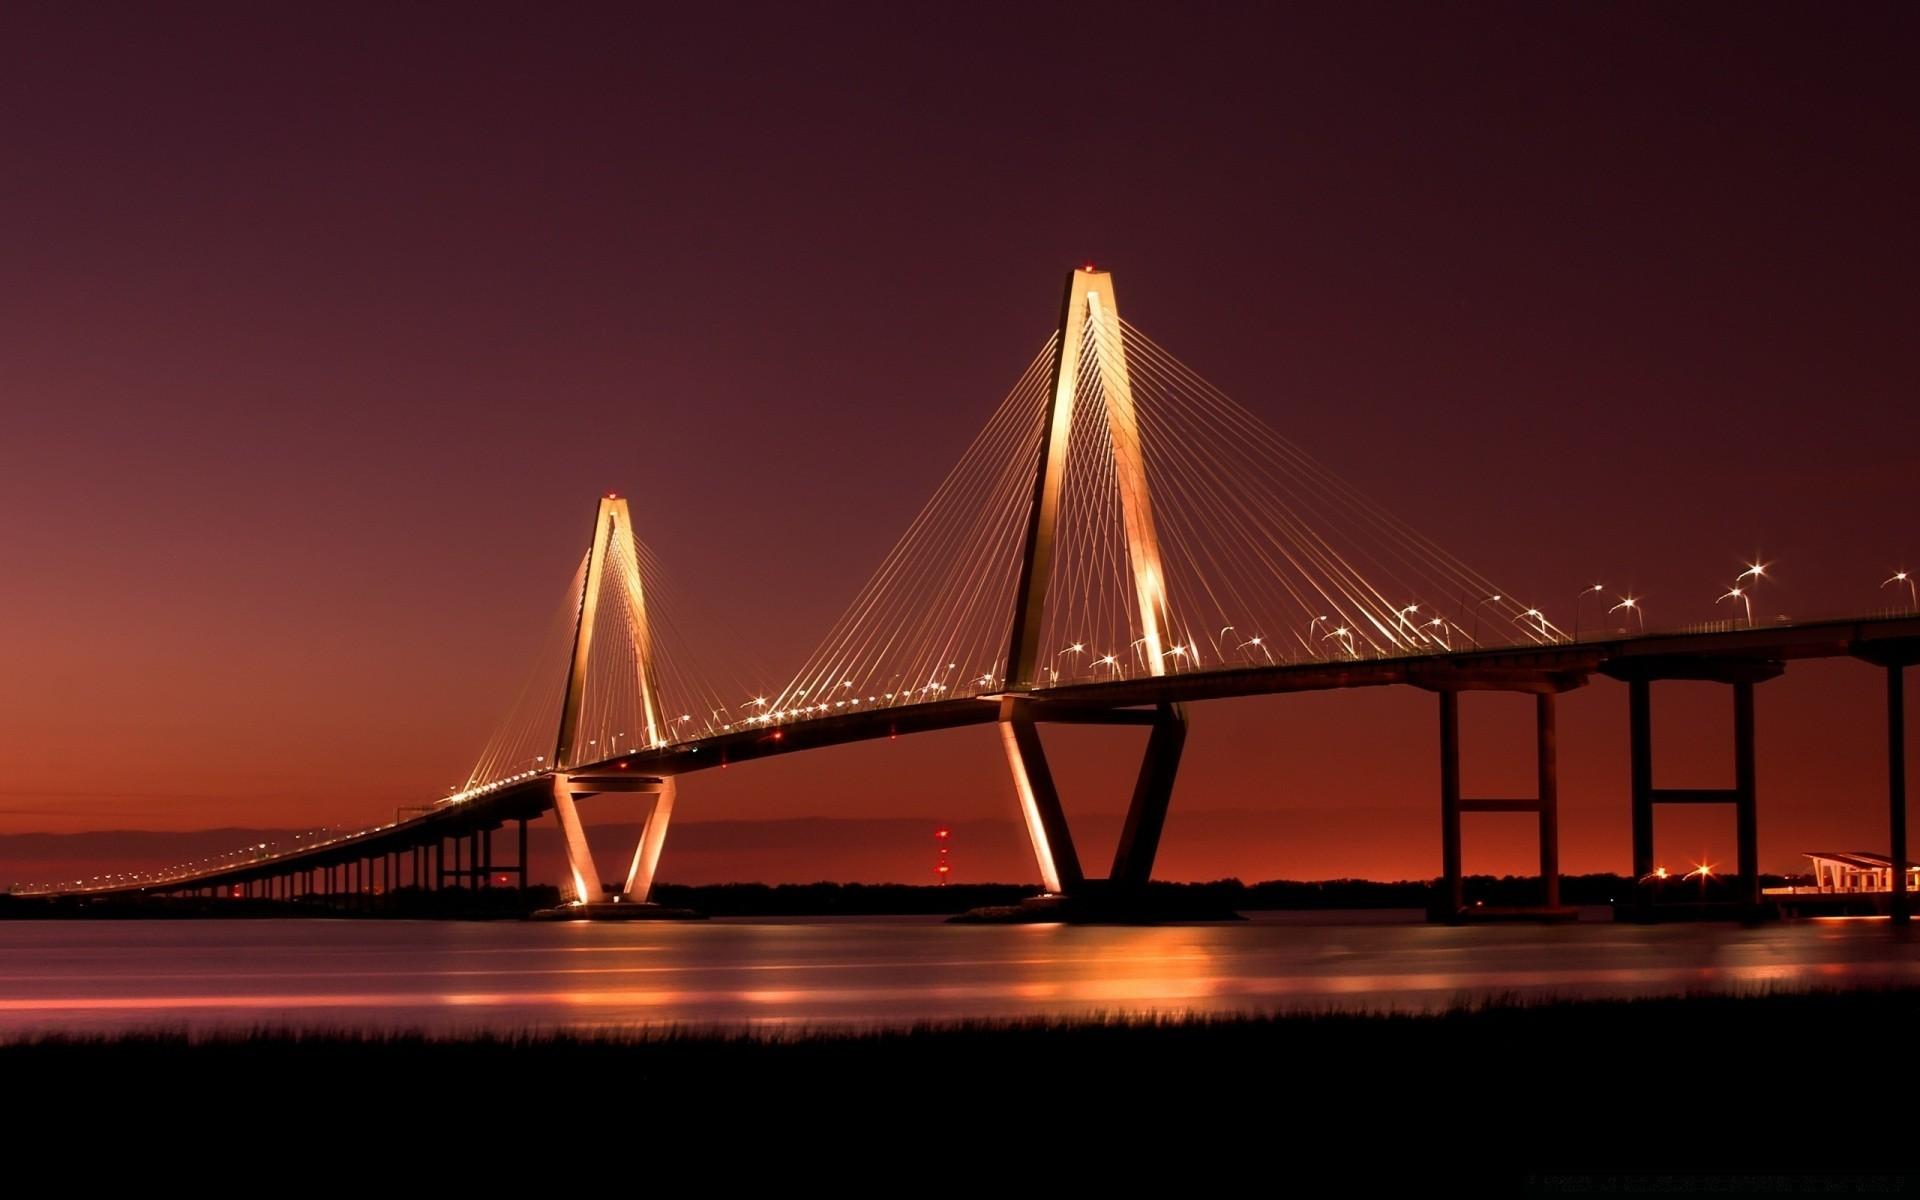 Картинки на мосту, взаимно